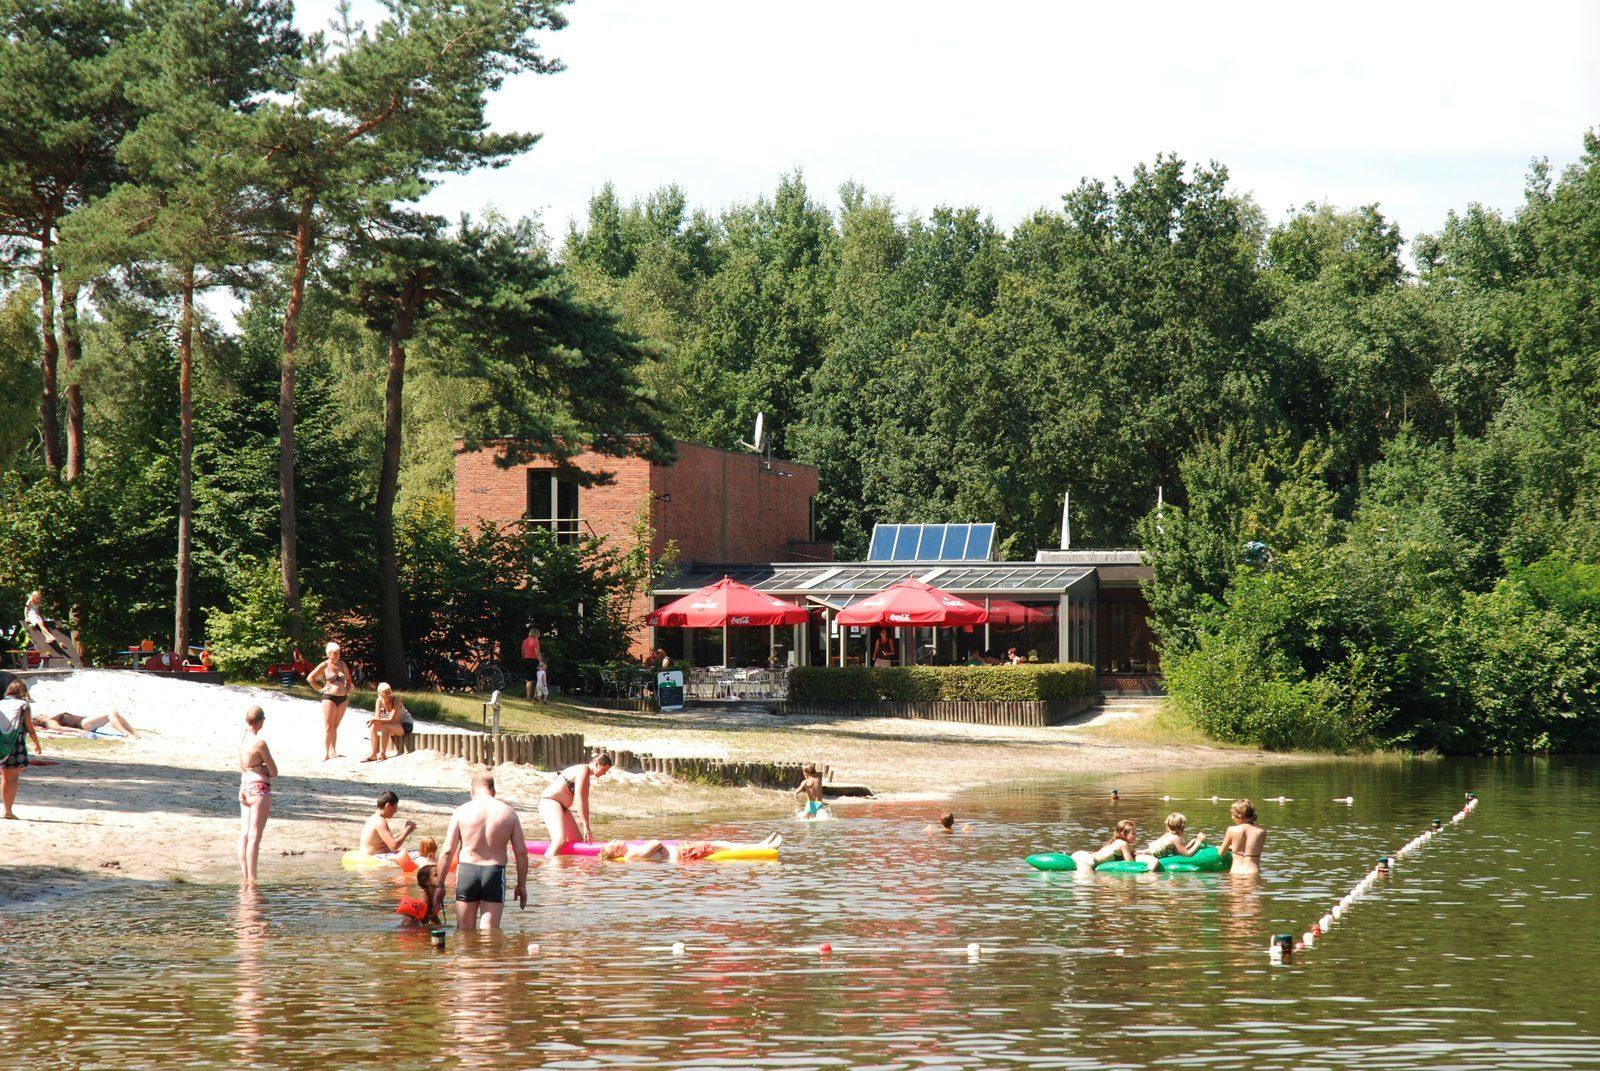 Zwemvijver met ligstrand